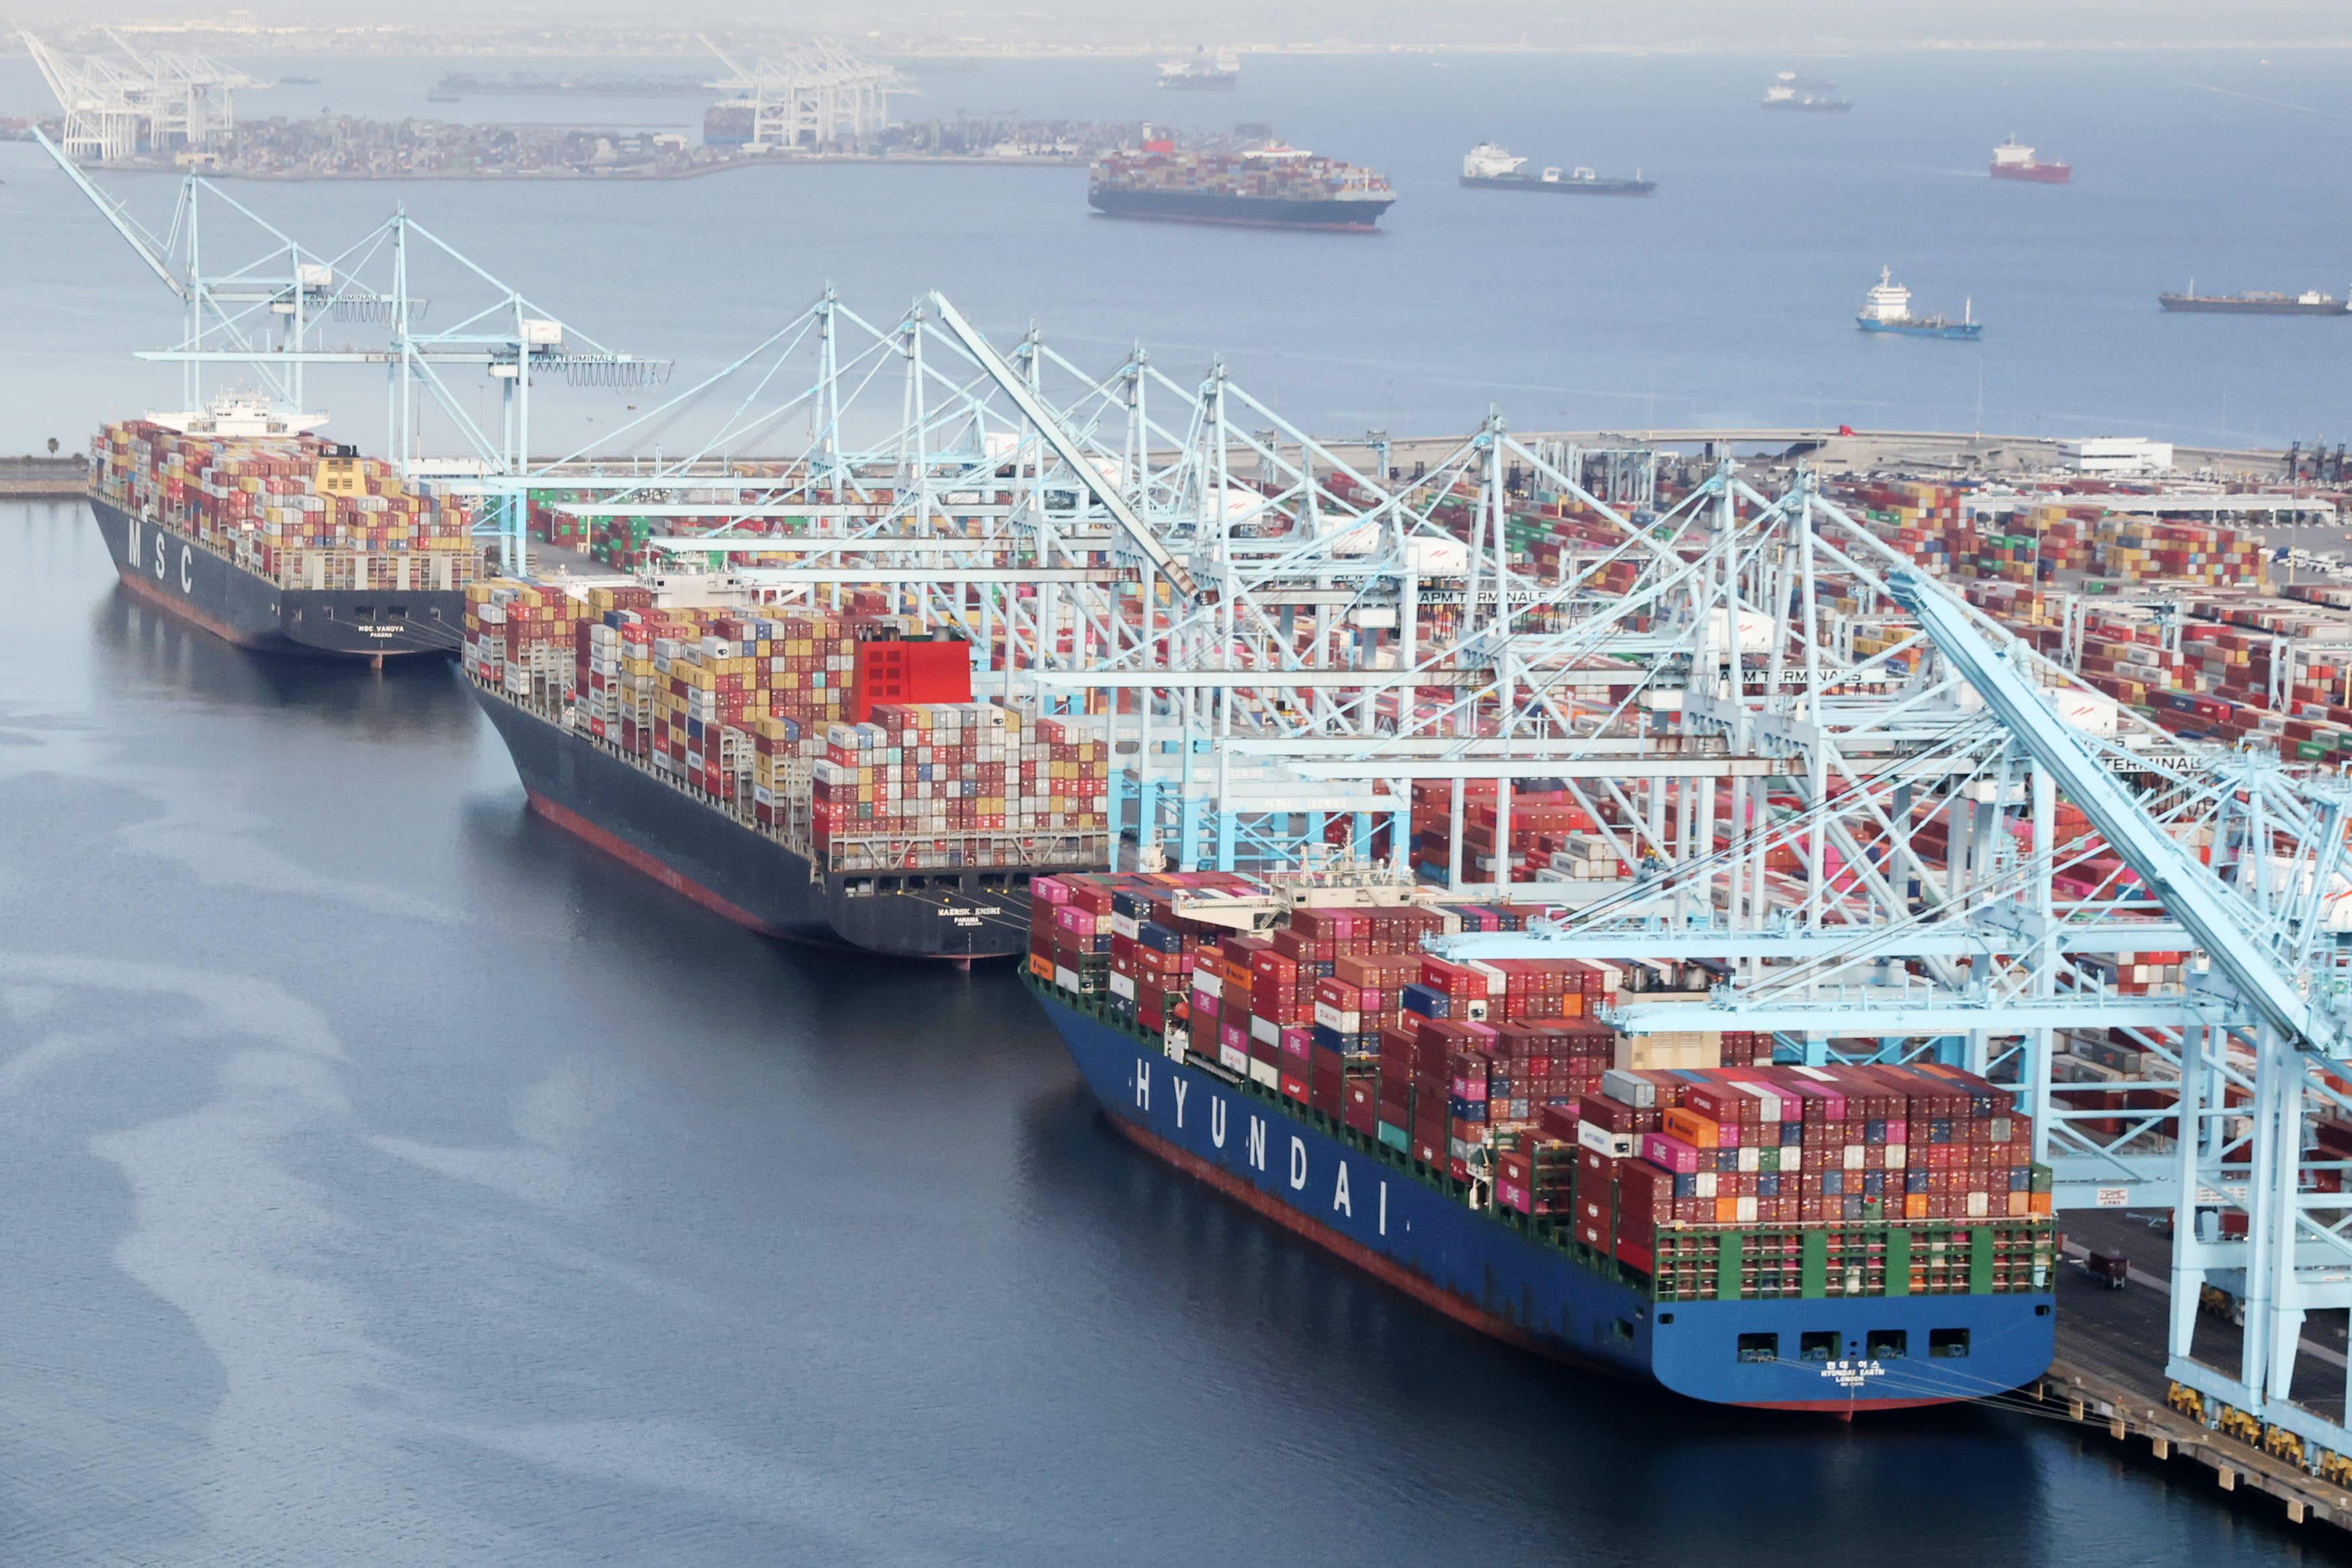 Supply chain slowdown hits at key pillars of economy and will likely get worse: Dan Yergin